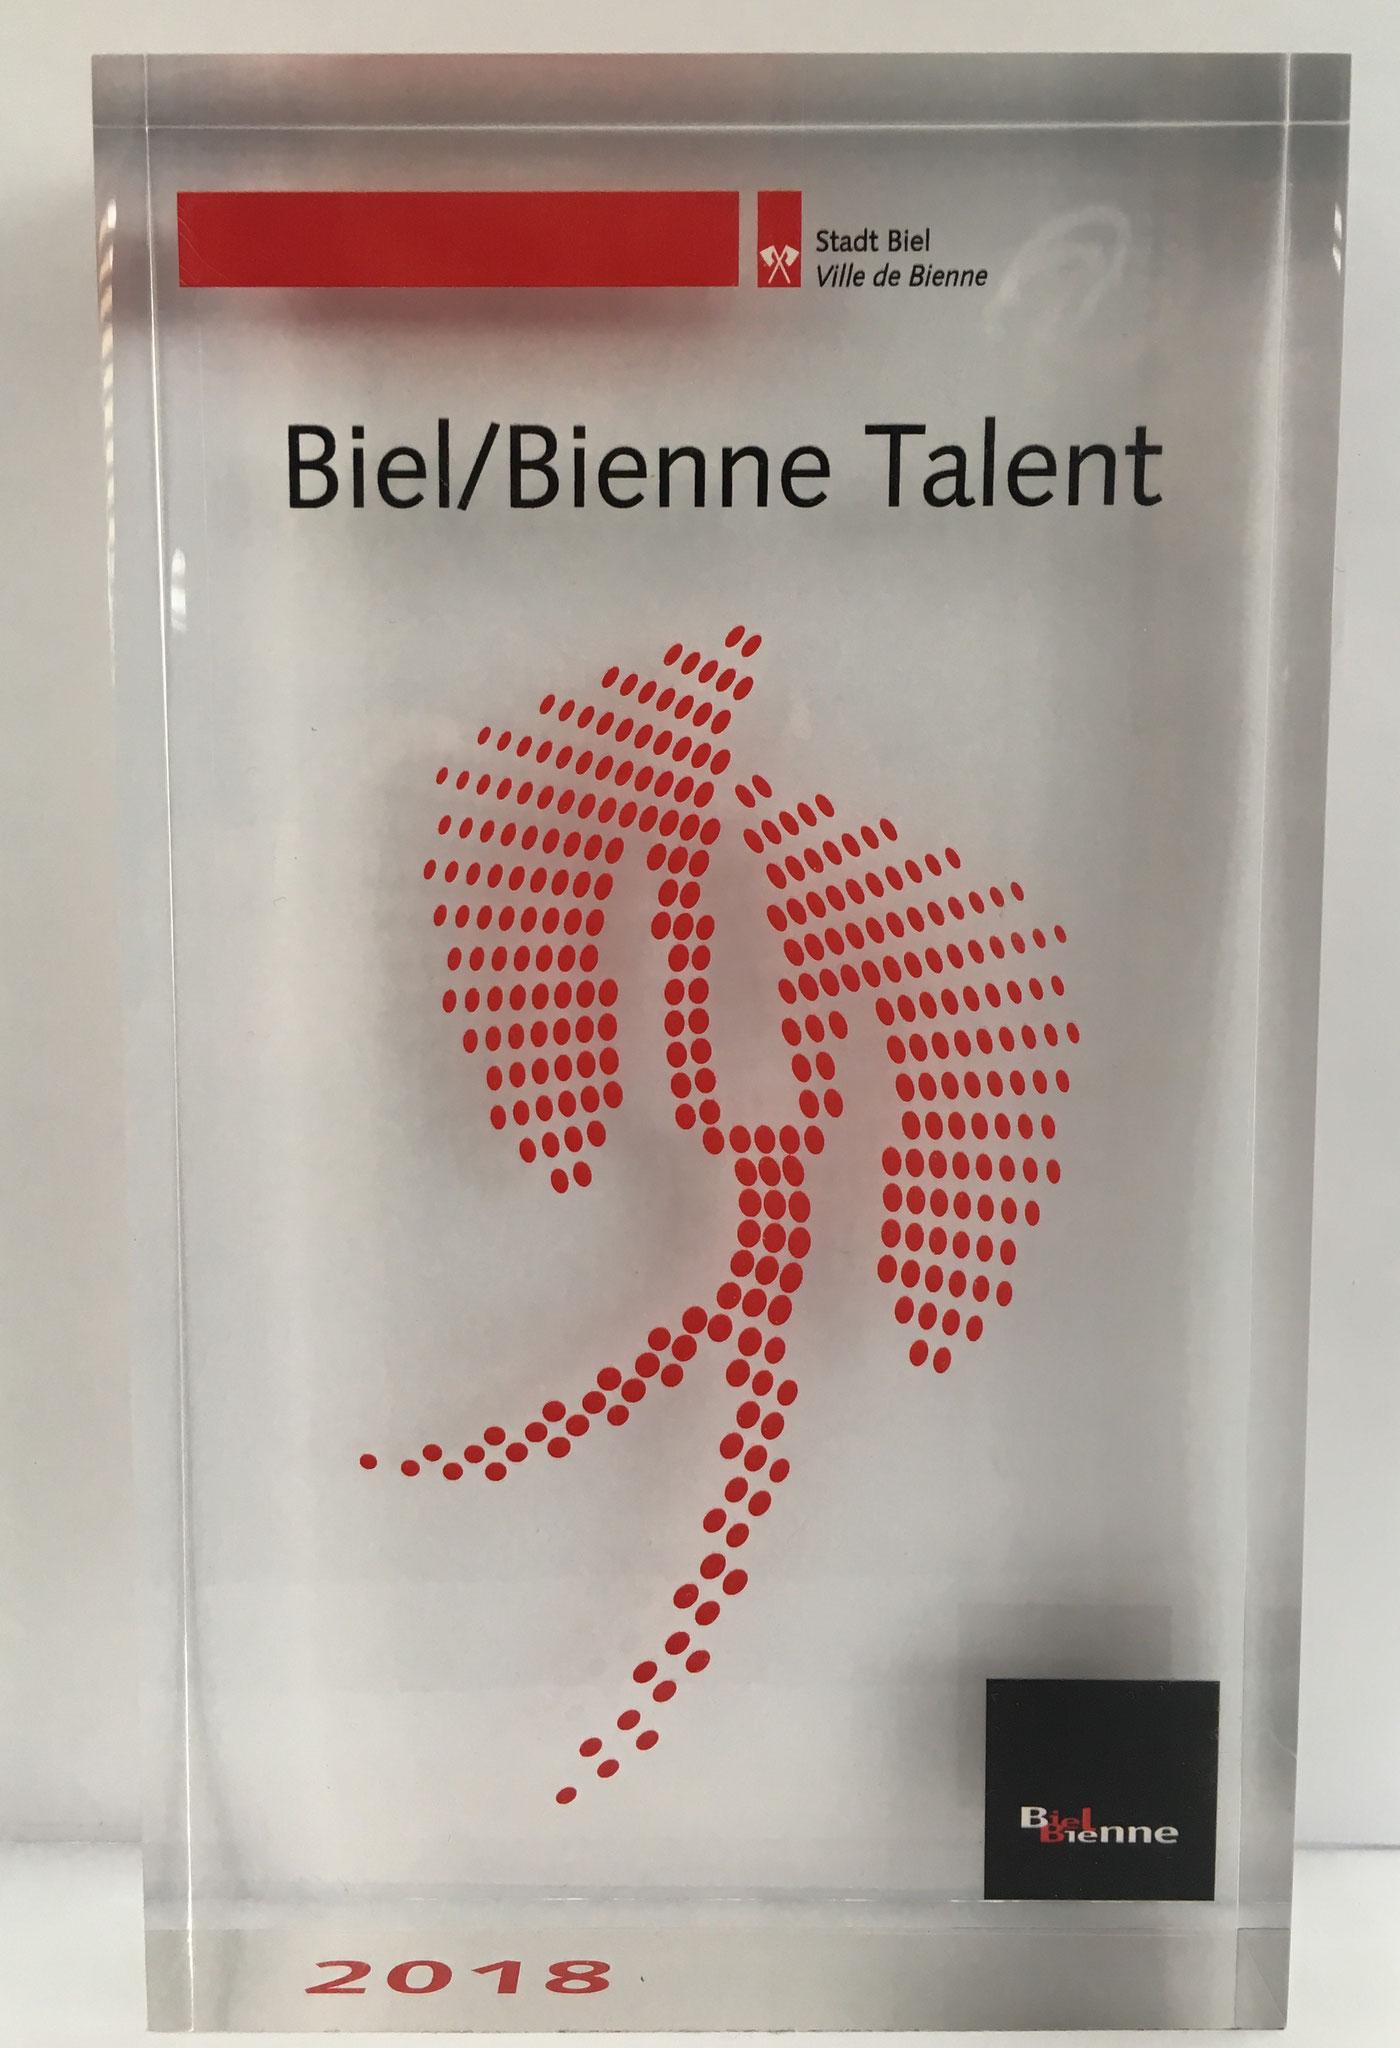 Biel / Bienne Talent Ehrung 2018